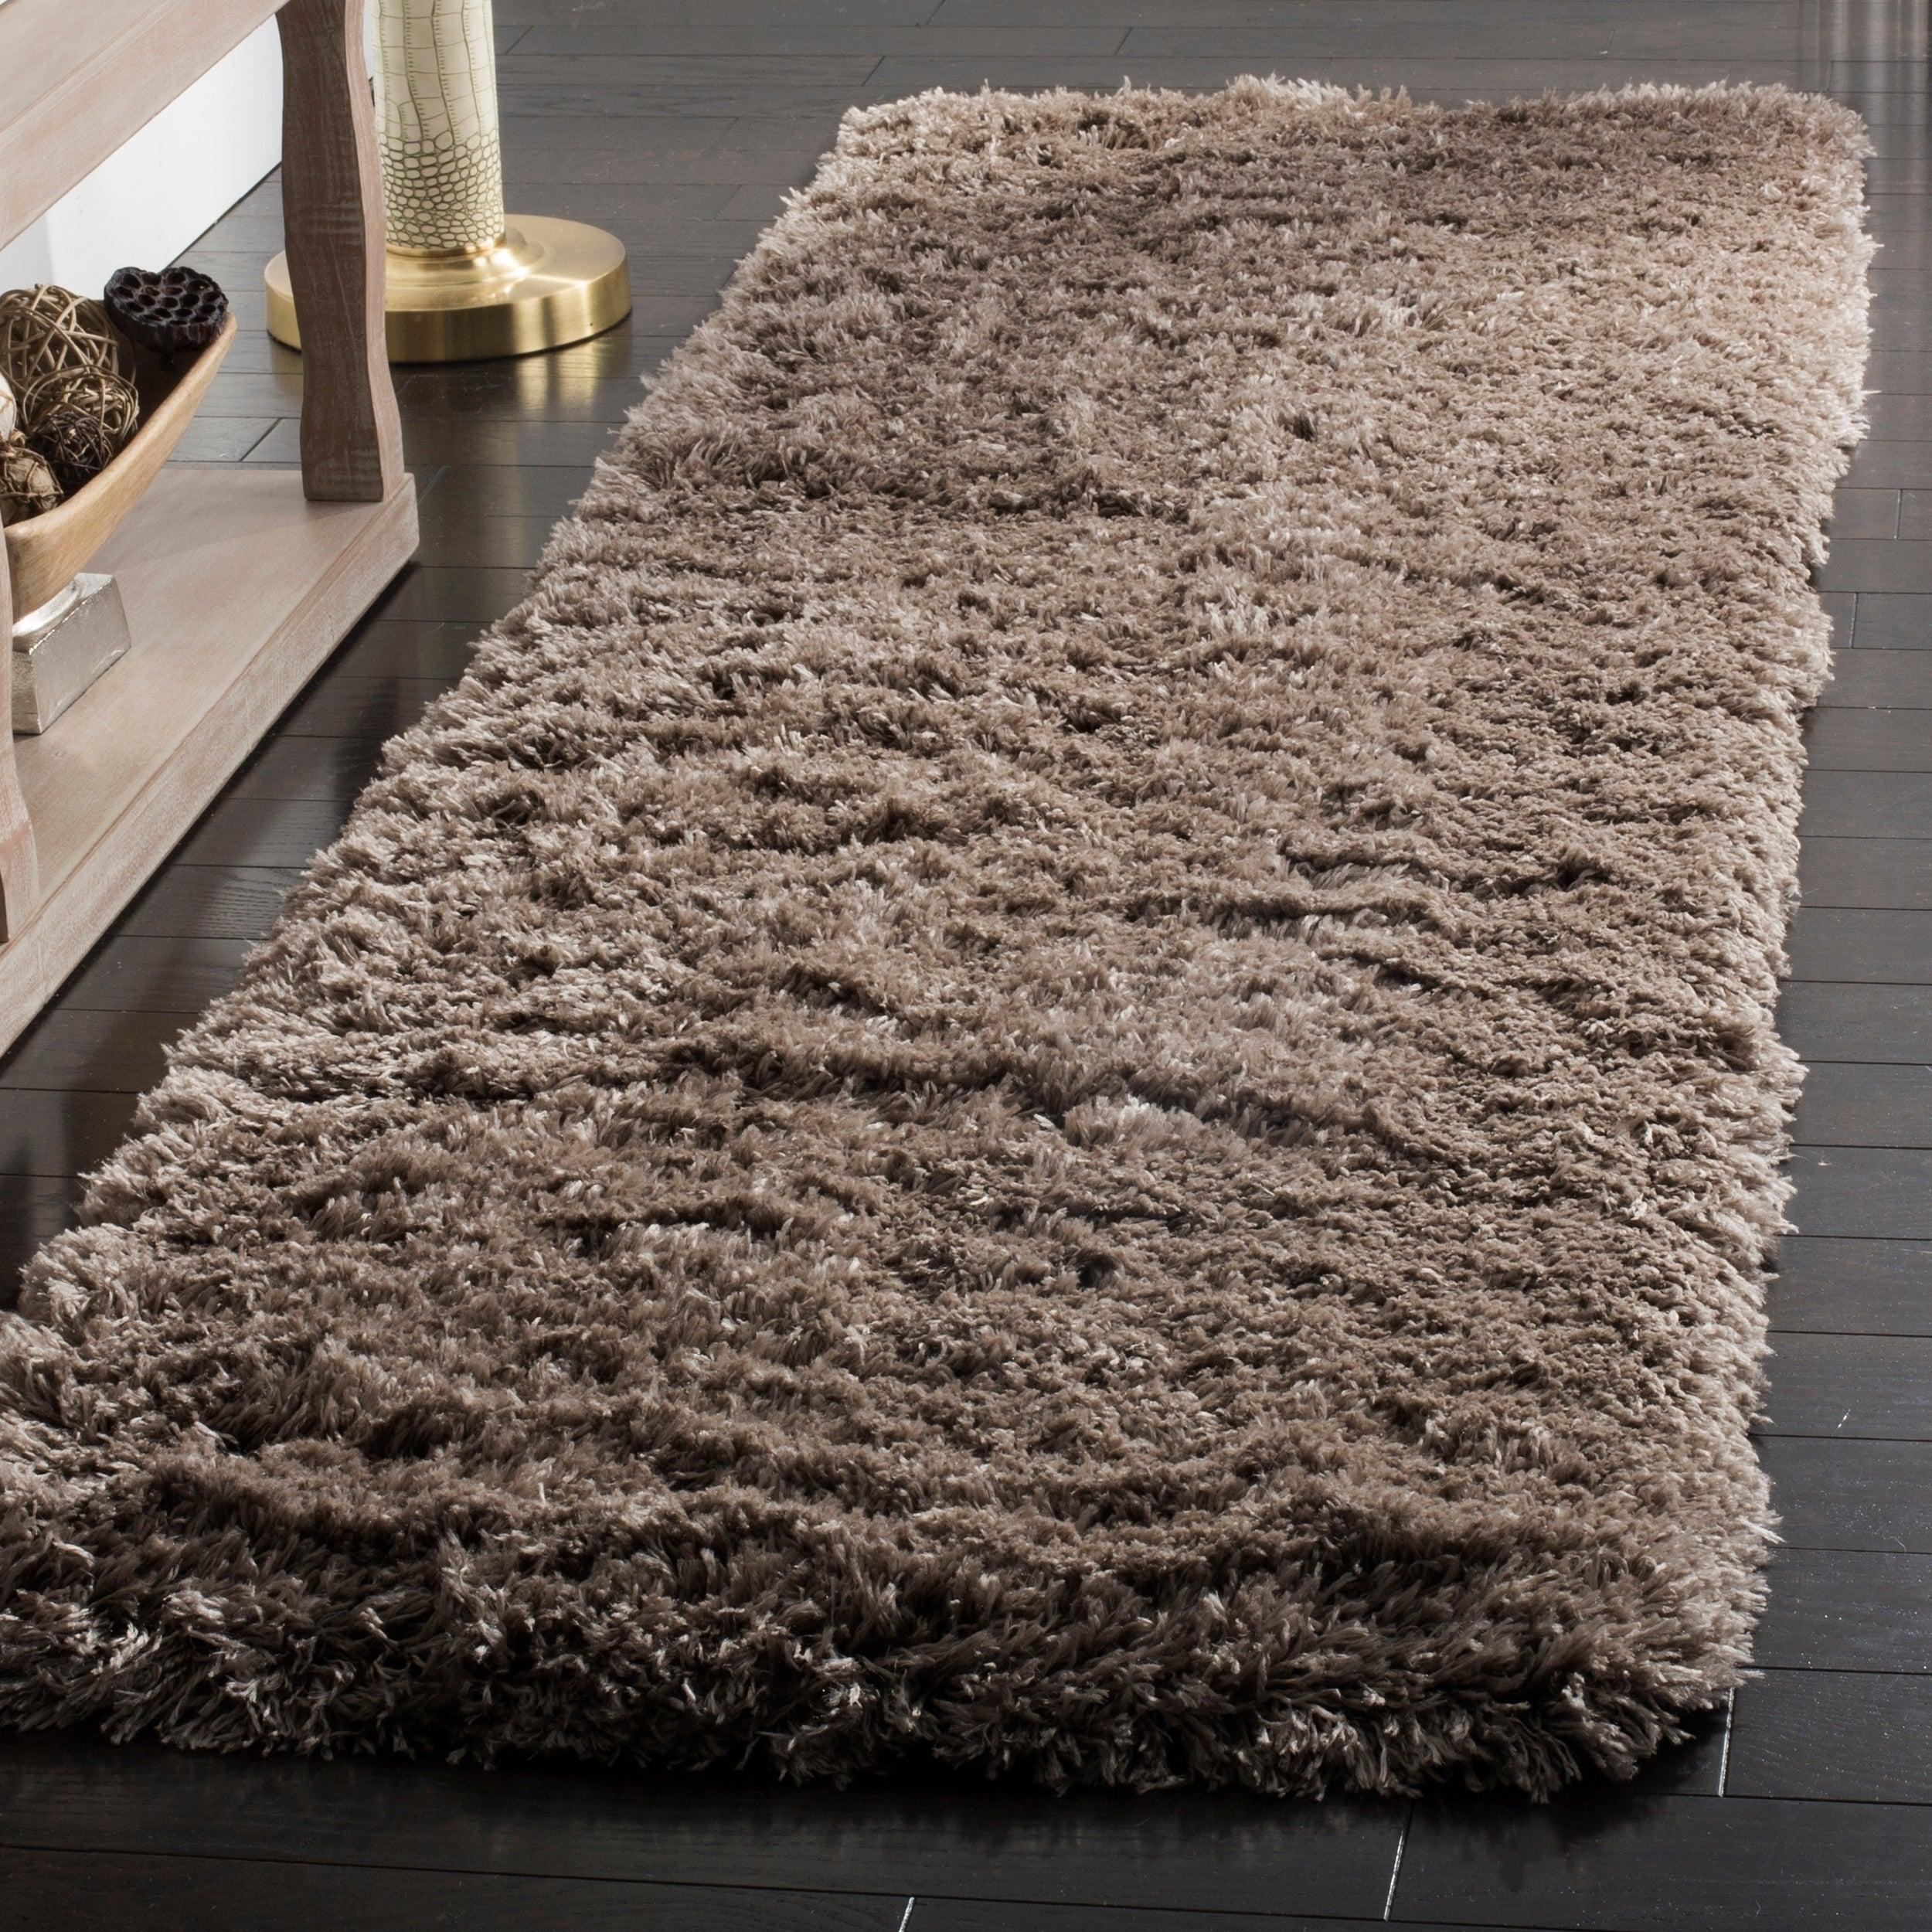 Safavieh Polar Shag Mushroom Polyester Rug (2'3 x 10') (P...